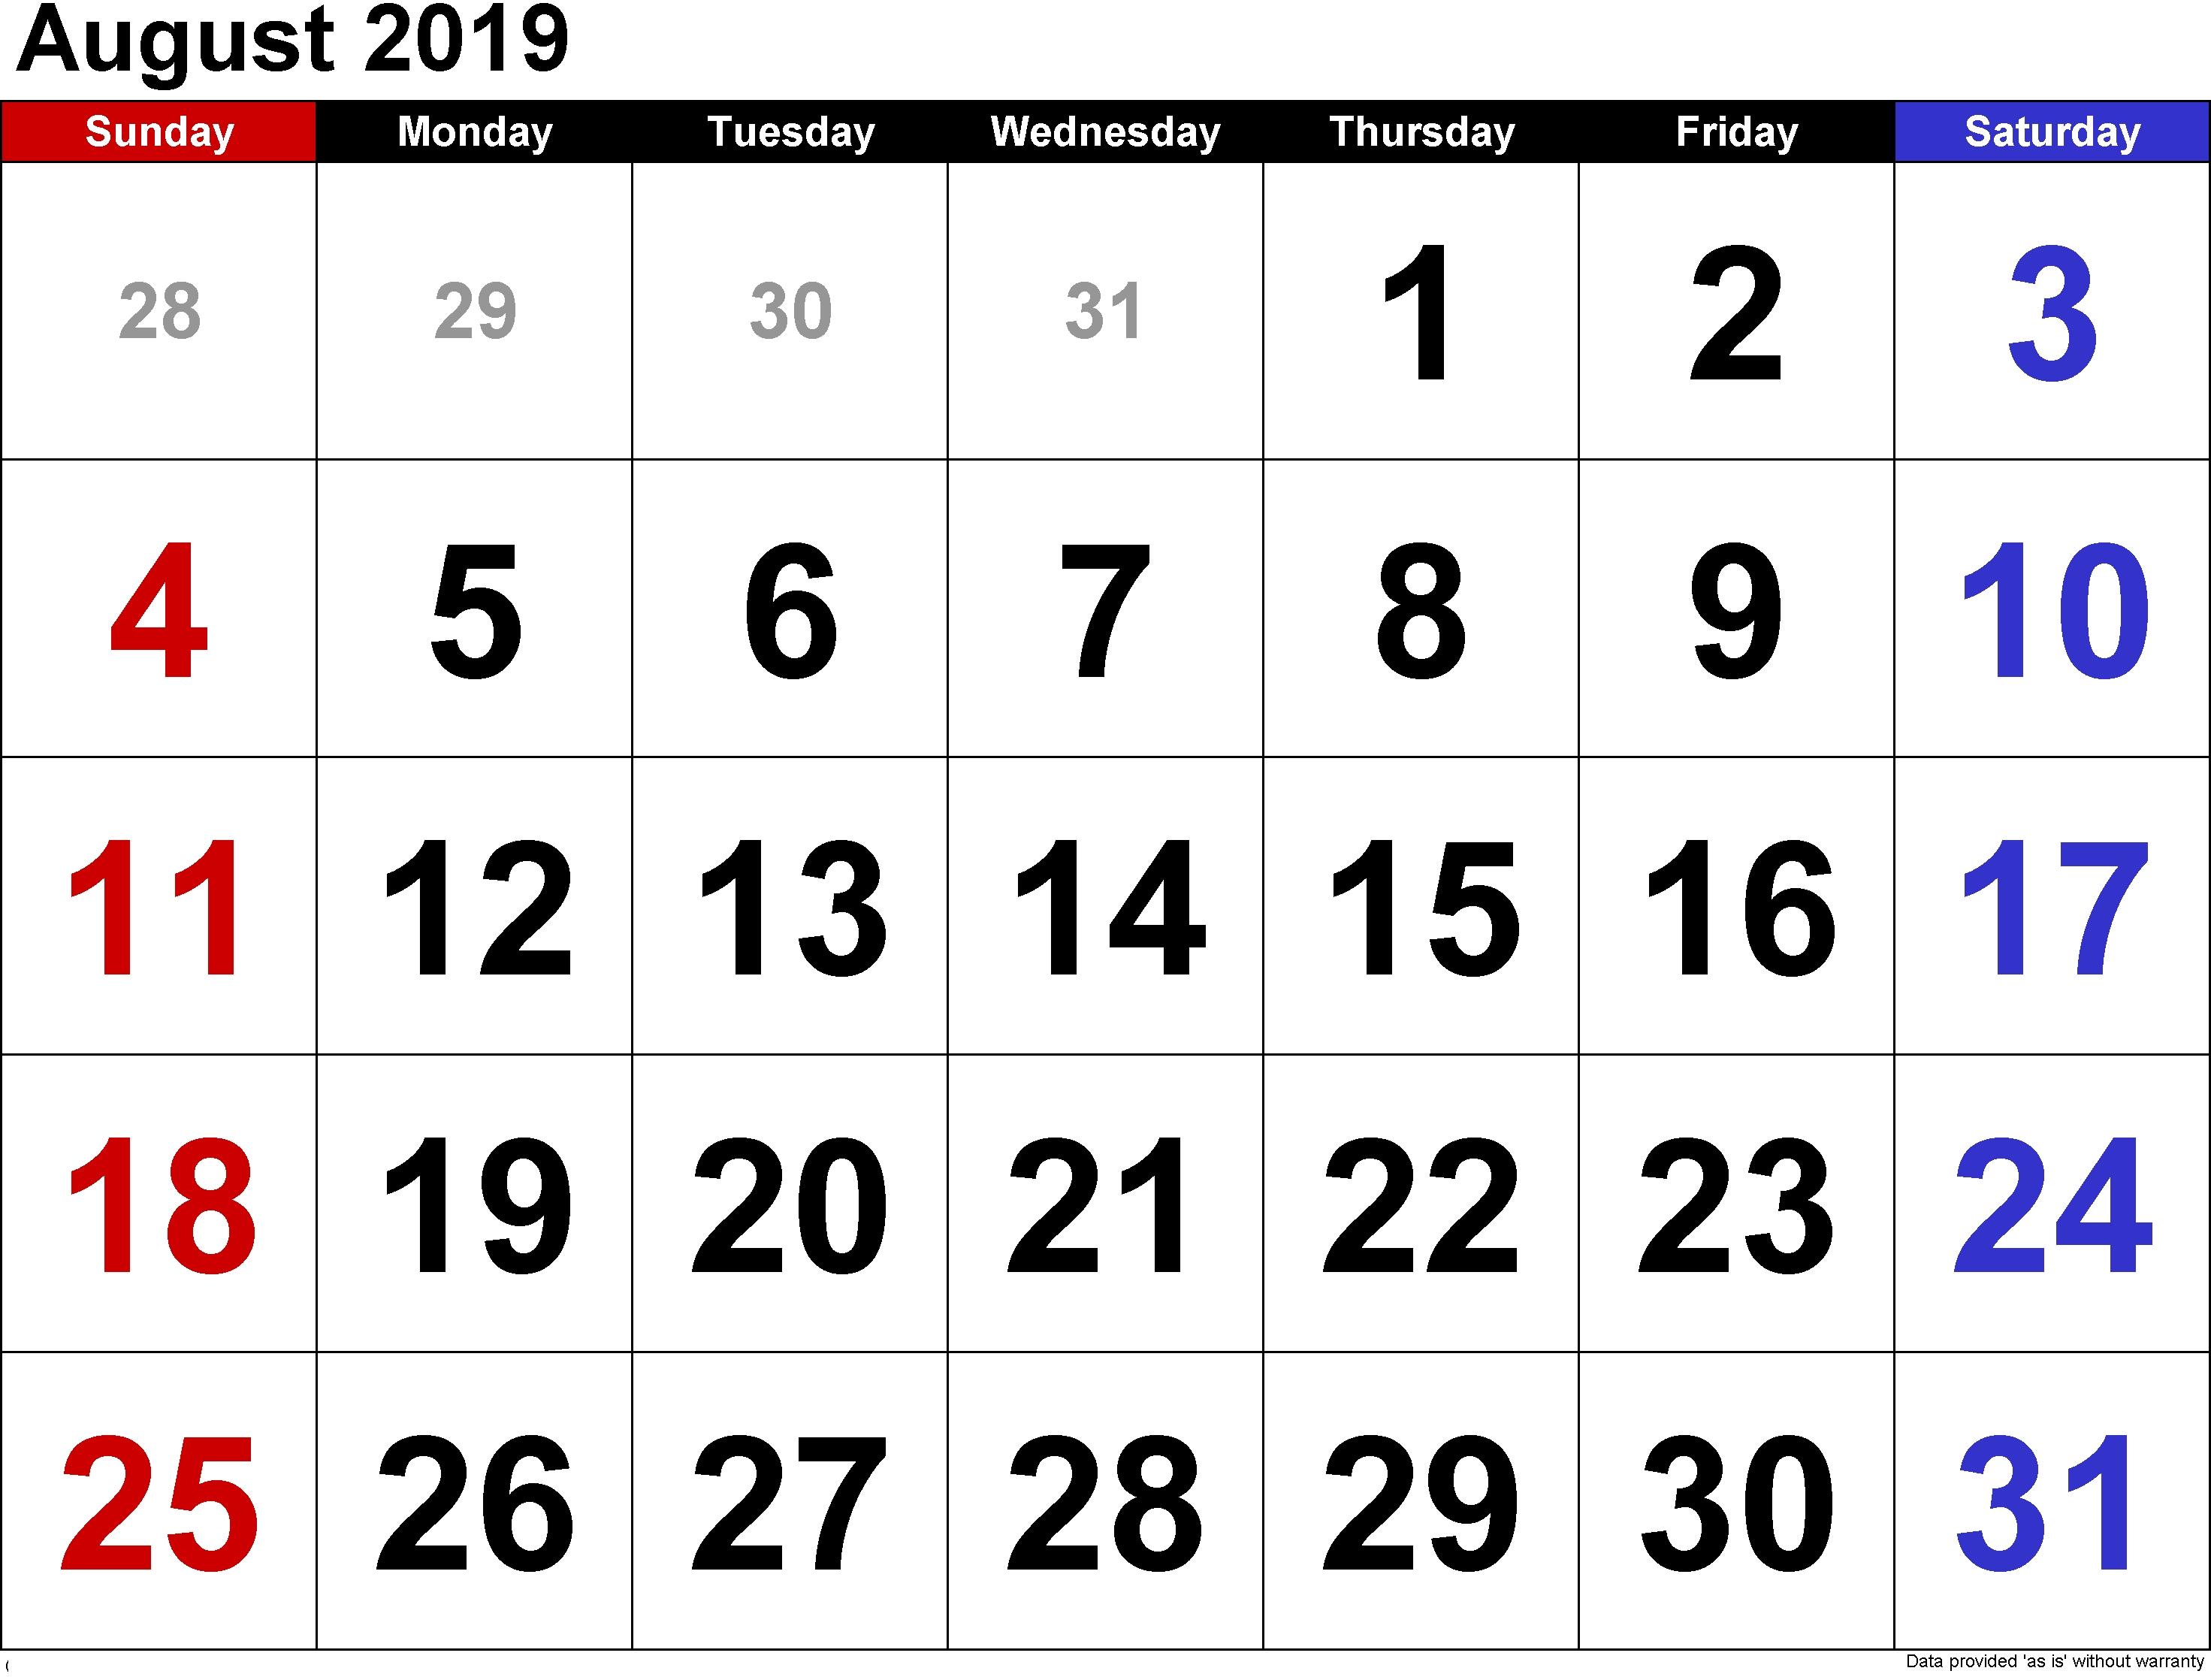 August 2019 Blank Holiday Calendar – Printable Calendar 2018 19 Calendar Of 2019 August